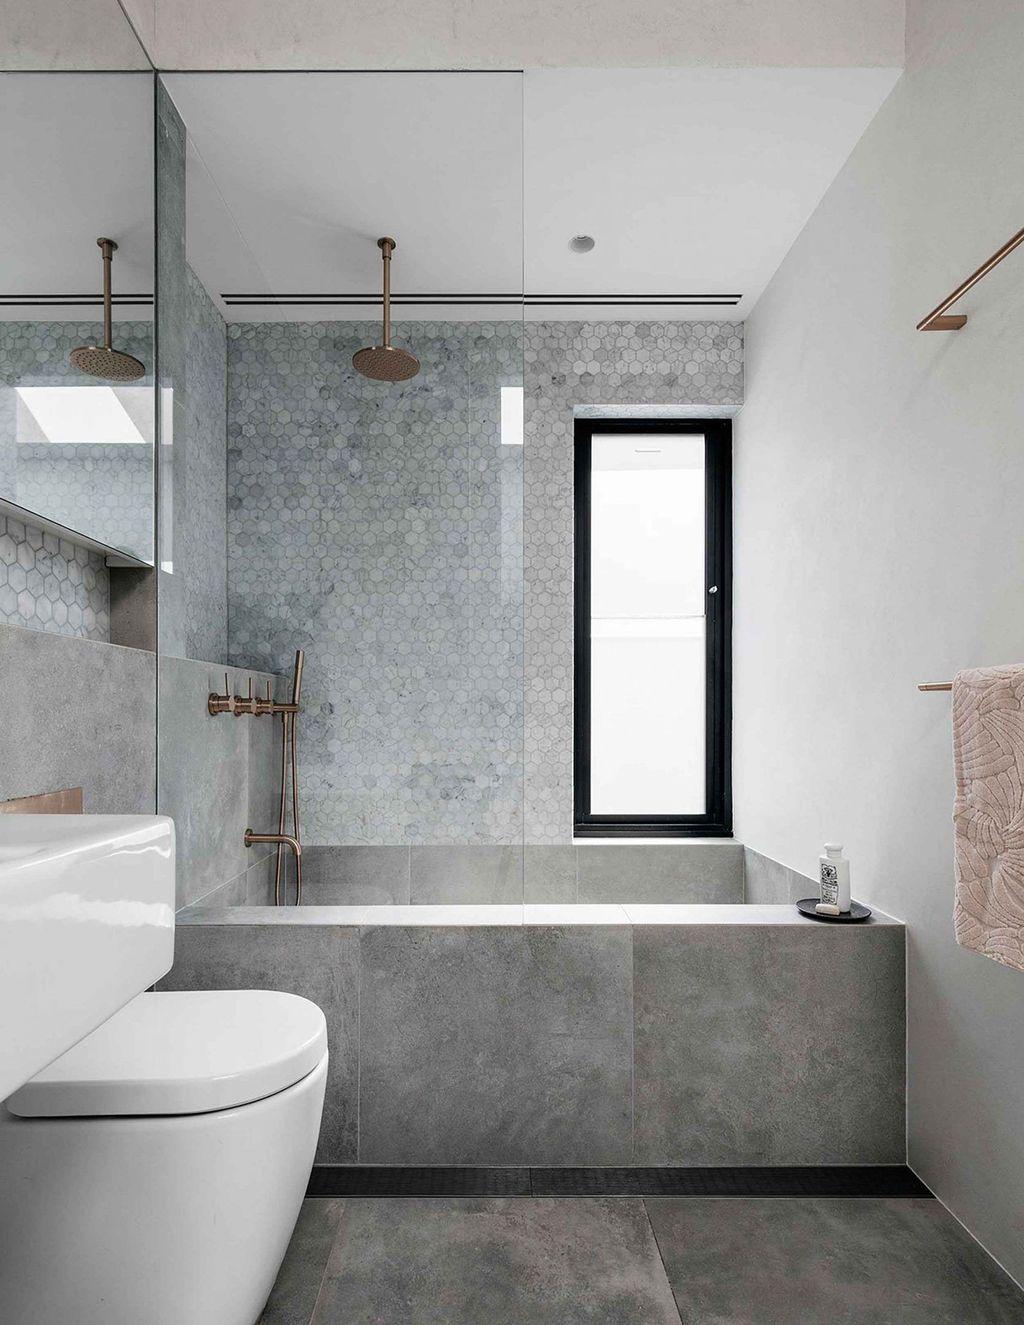 Fabulous Minimalist Bathroom Decor Ideas That Become Everyones Dream 32